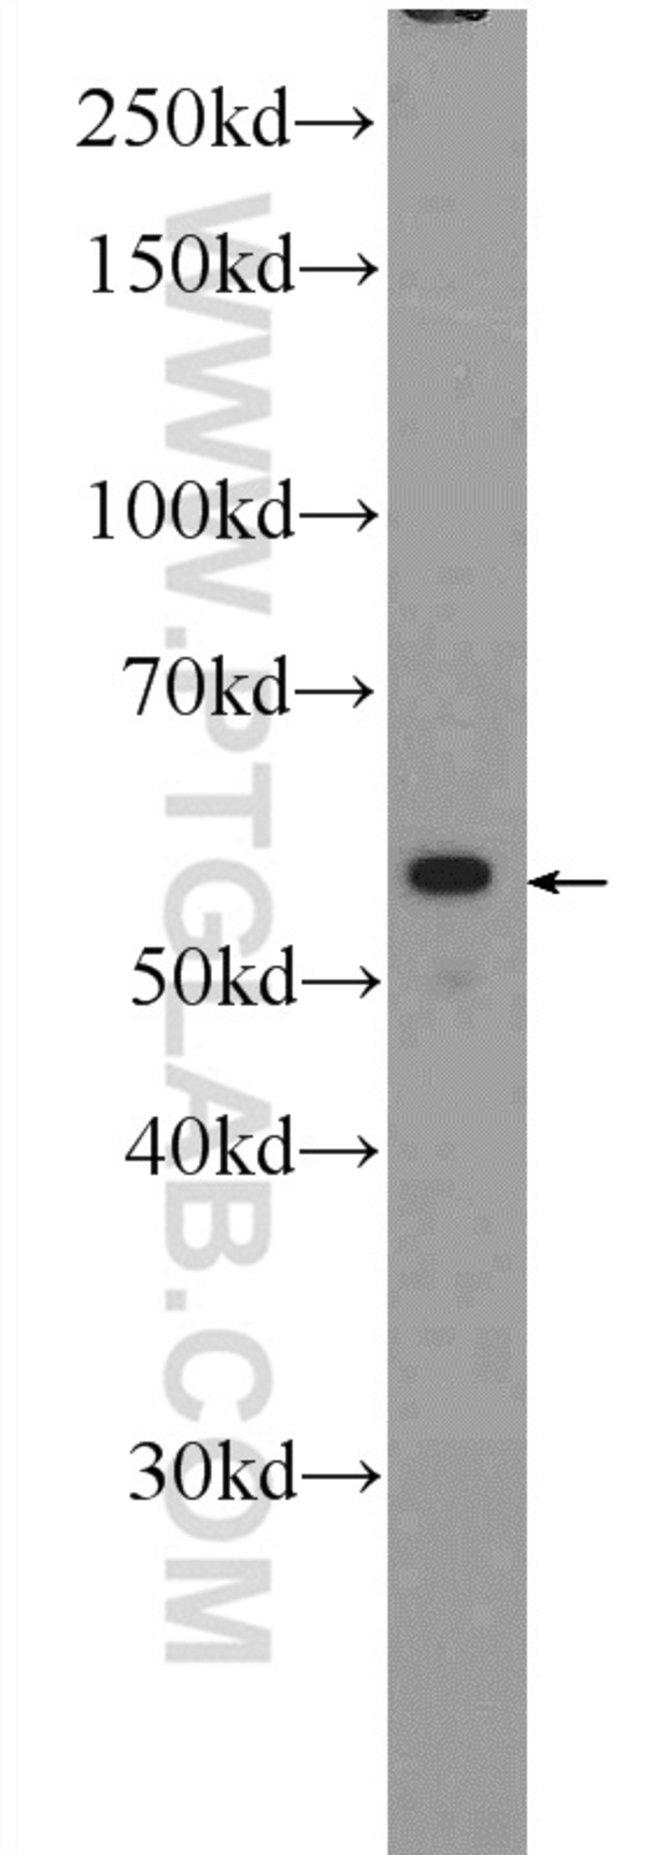 POLG2 Rabbit anti-Human, Mouse, Rat, Polyclonal, Proteintech 150 μL; Unconjugated Ver productos